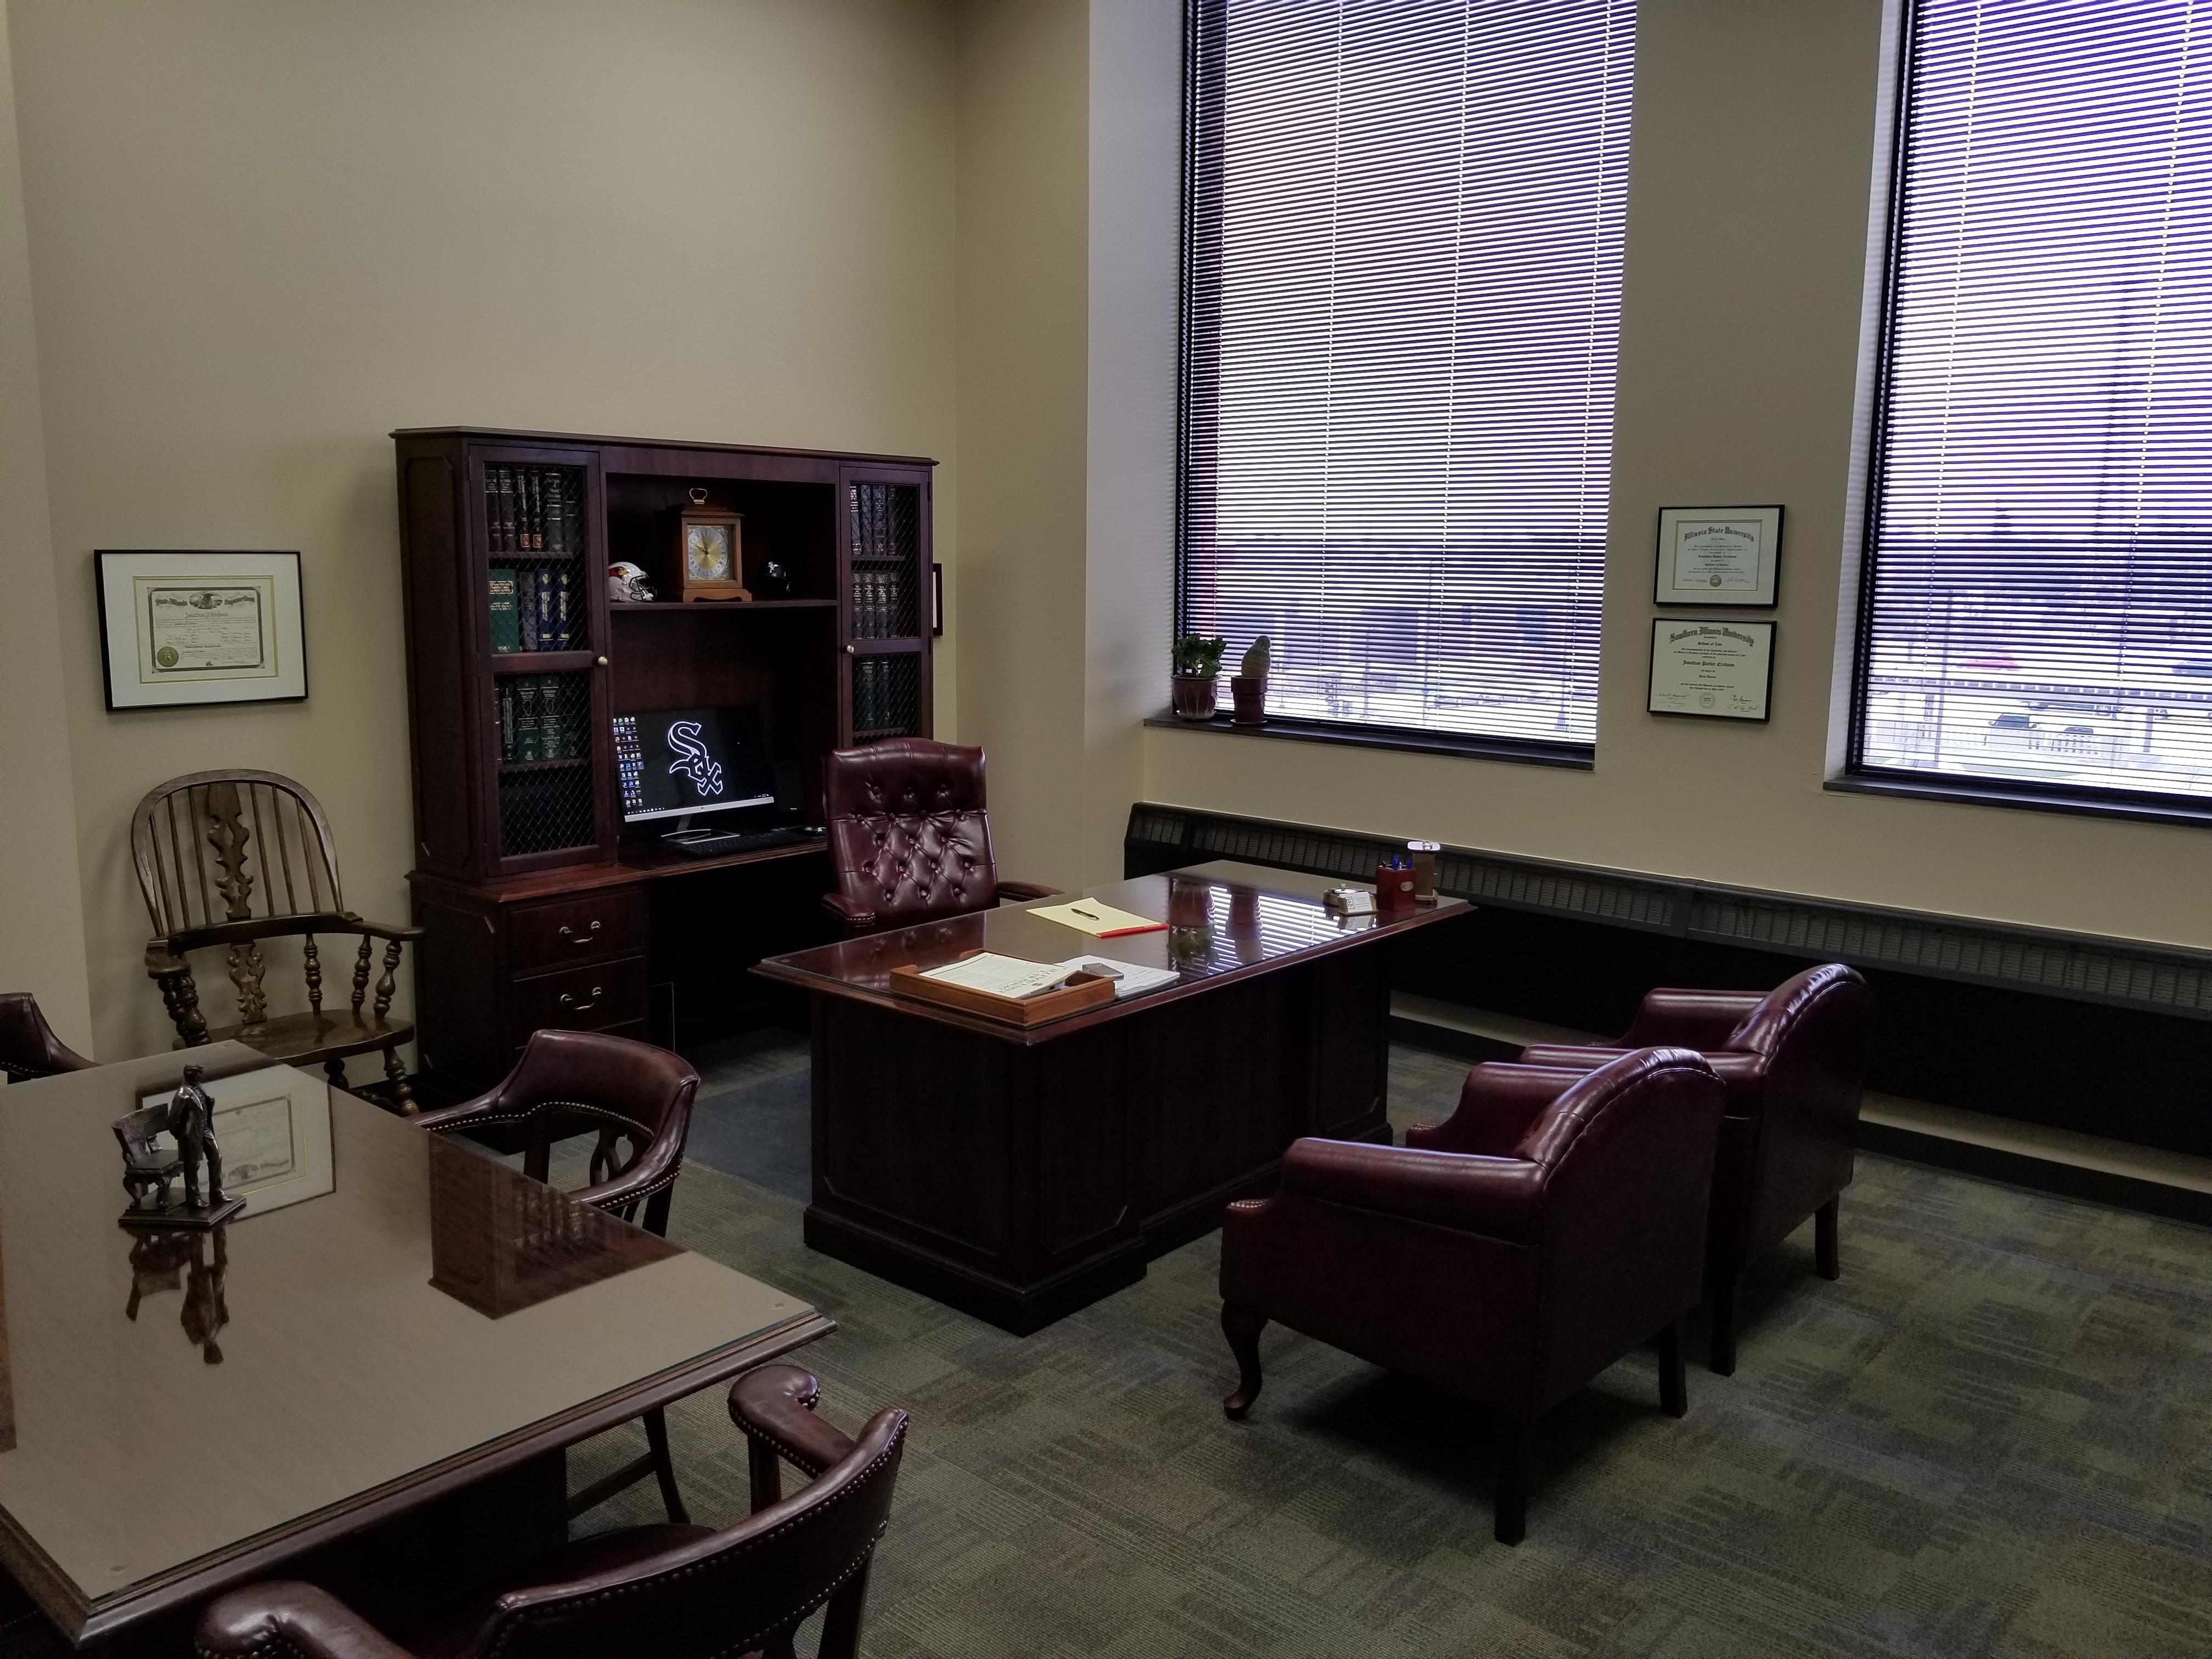 Jon P Erickson Law Office 132 S Water St Ste 260 Decatur